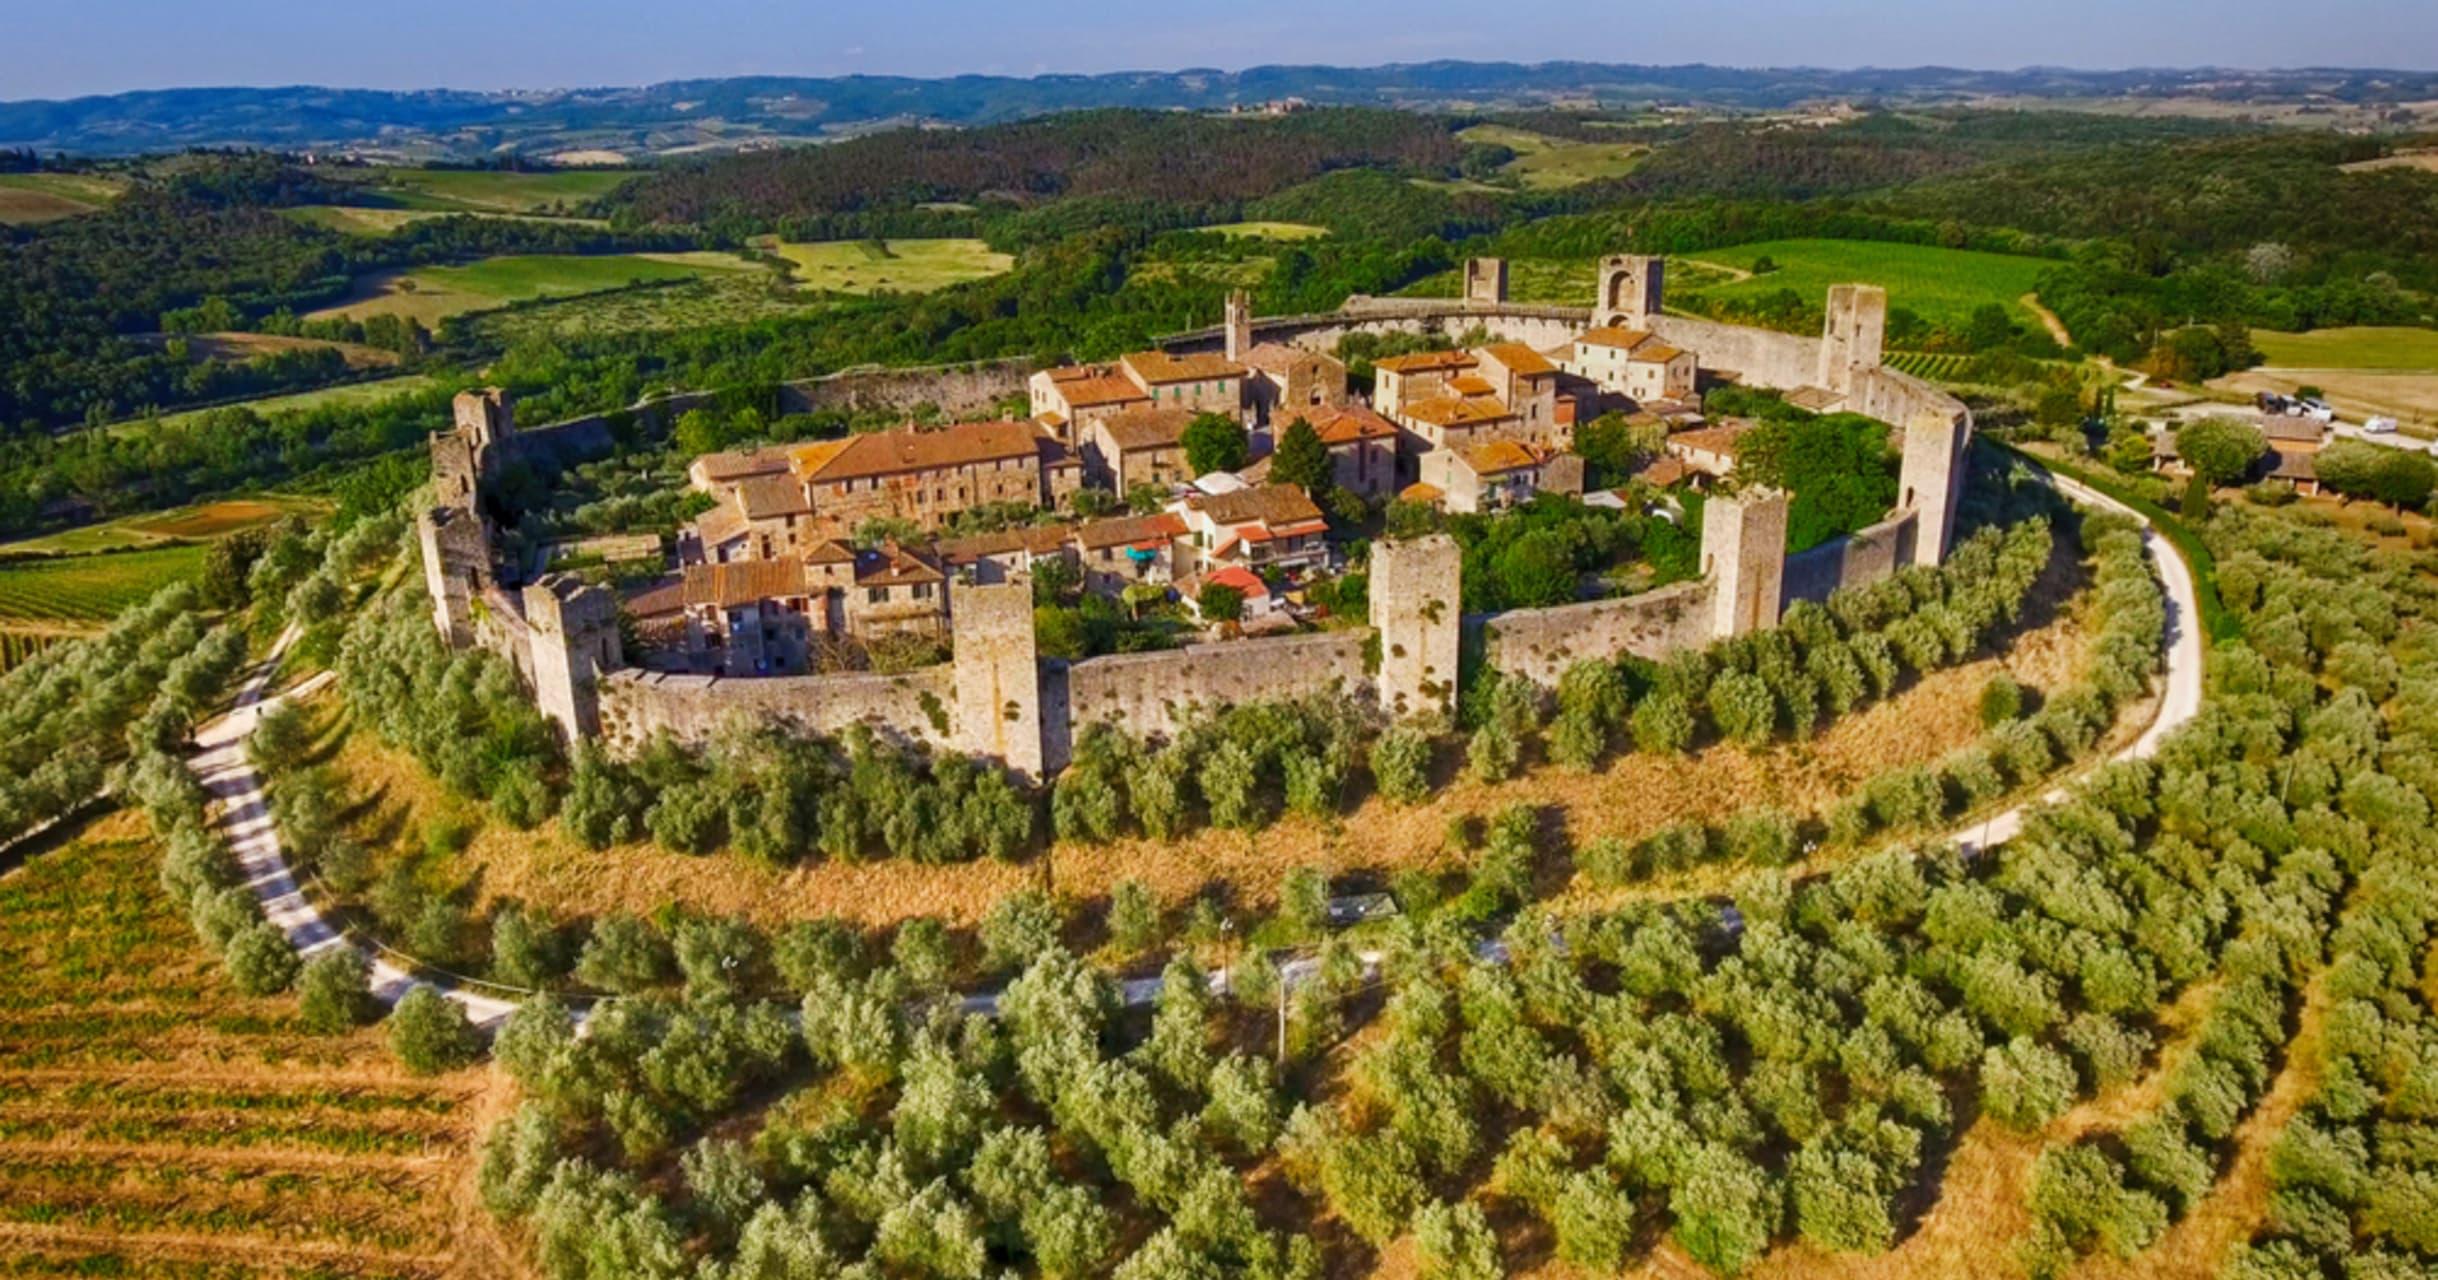 Tuscany - On the pilgrims path